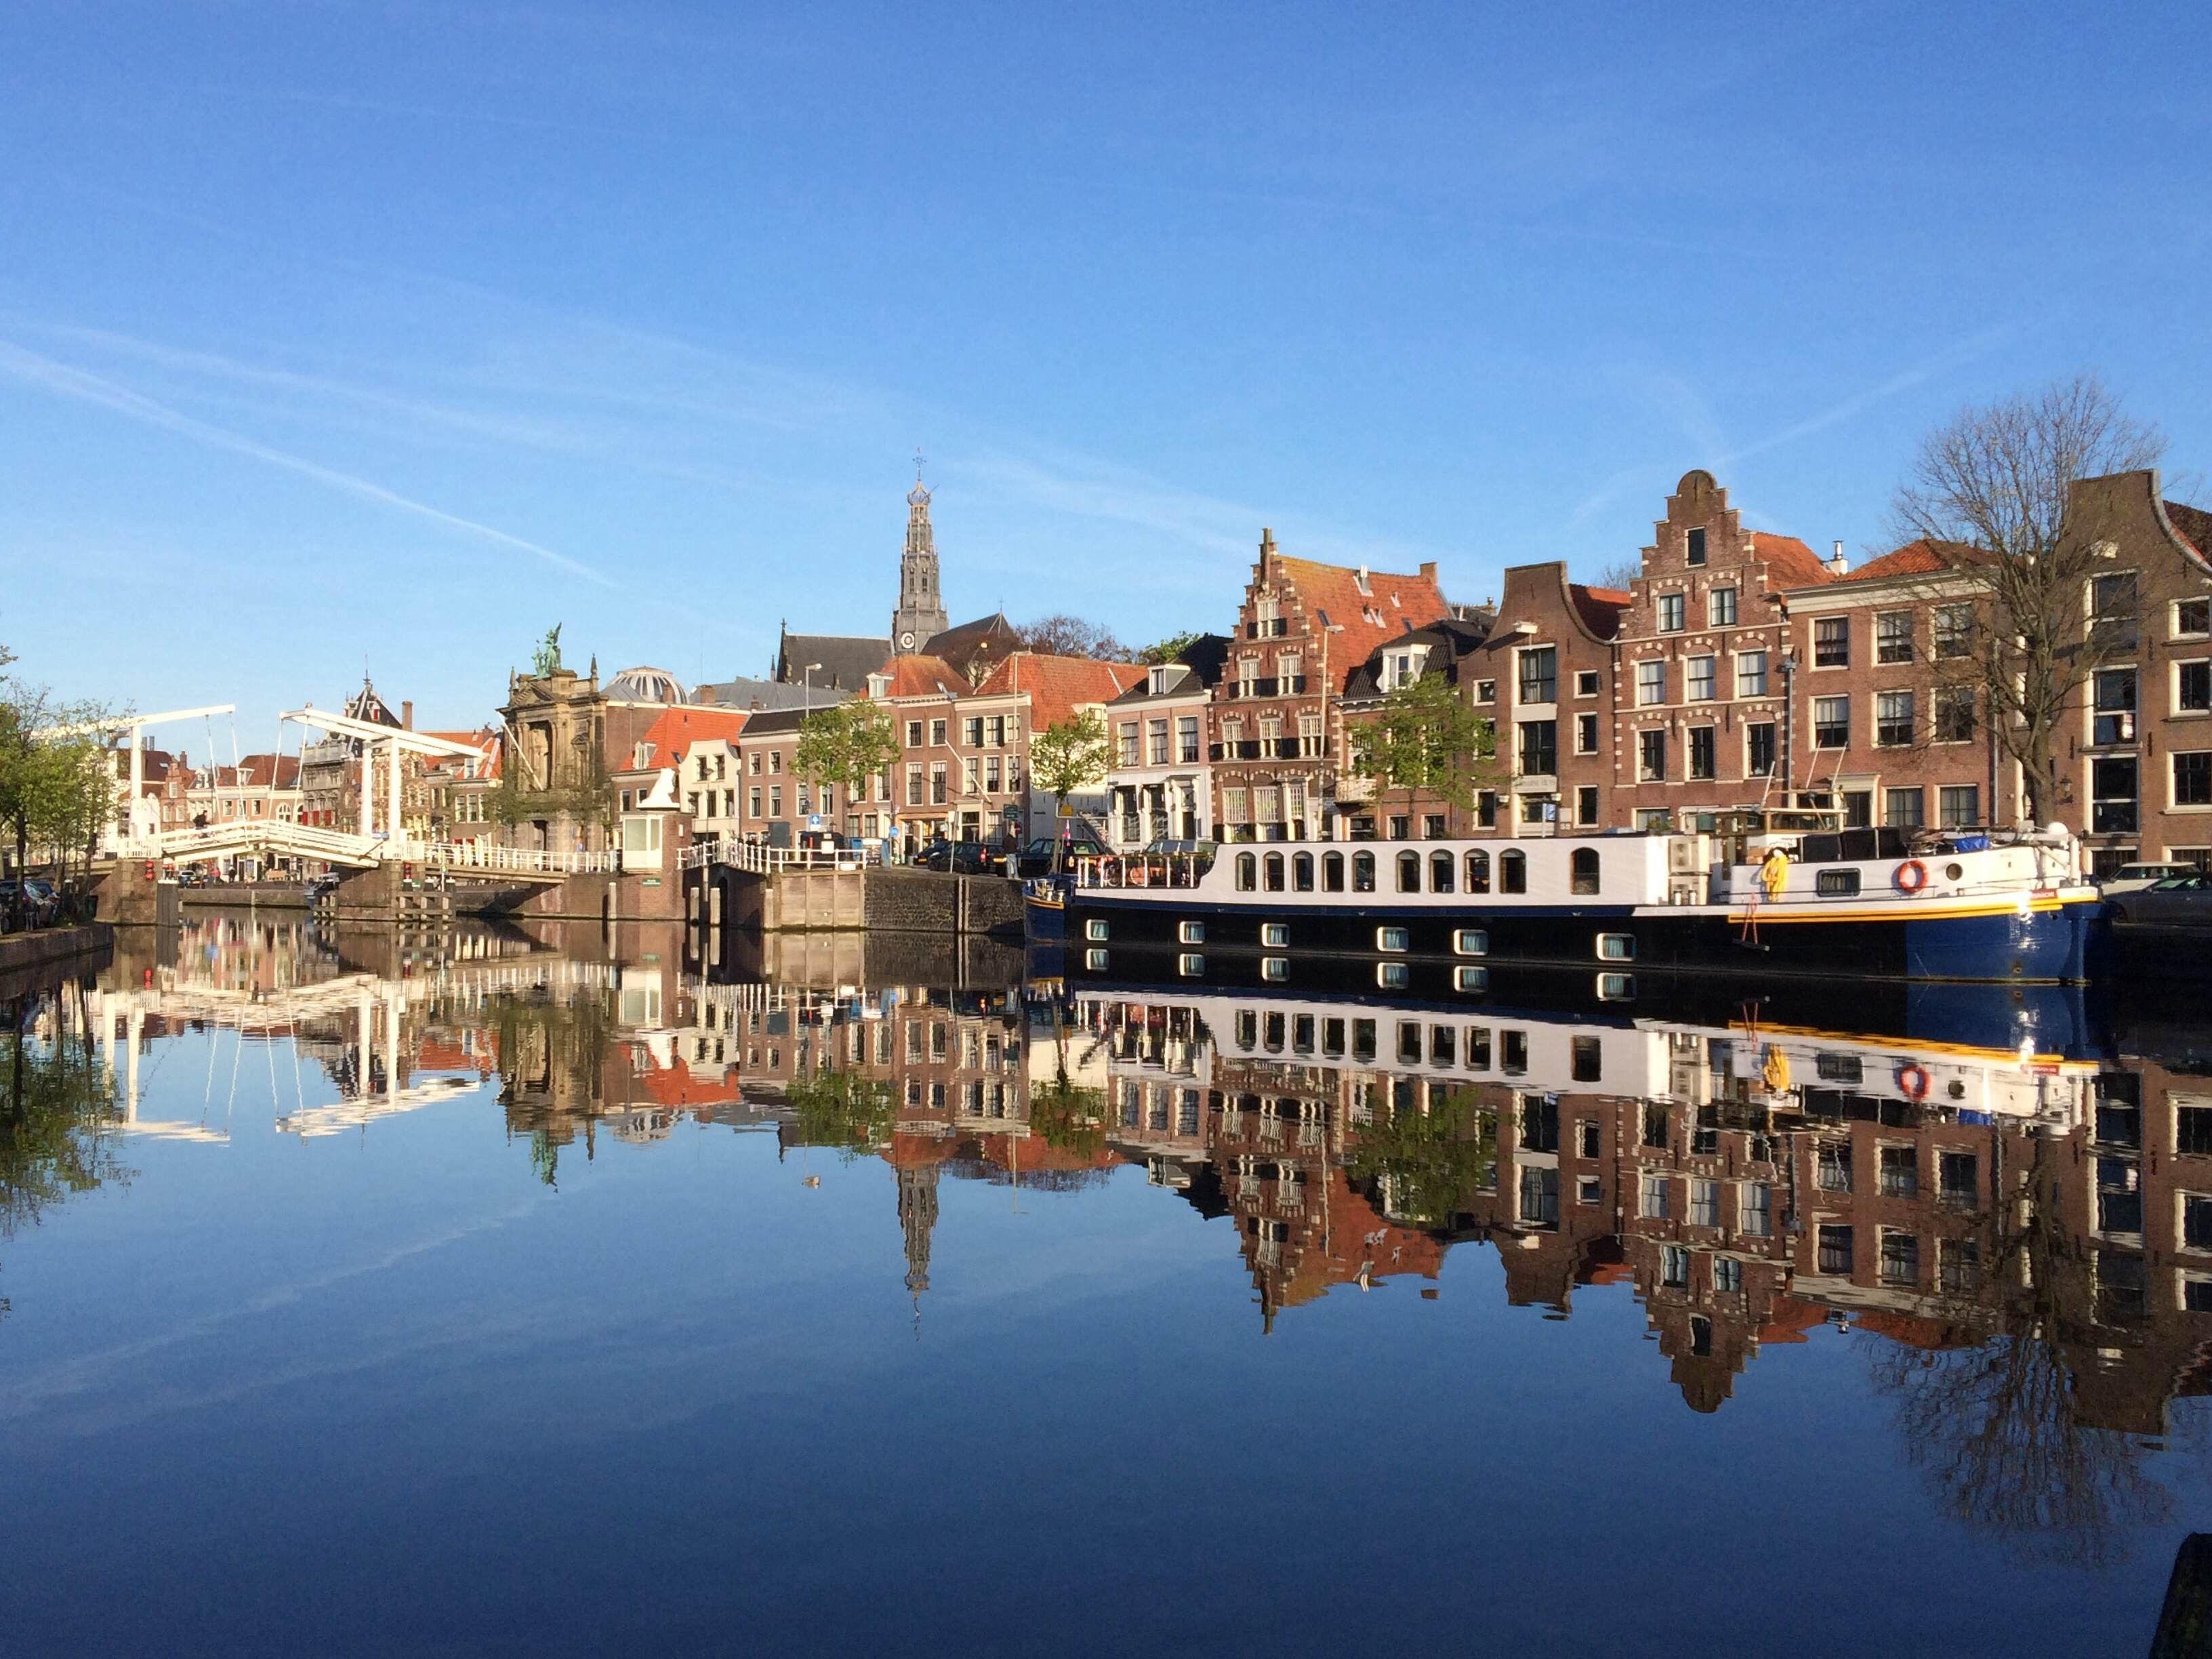 Holland - Panache moored in haarlem.jpg